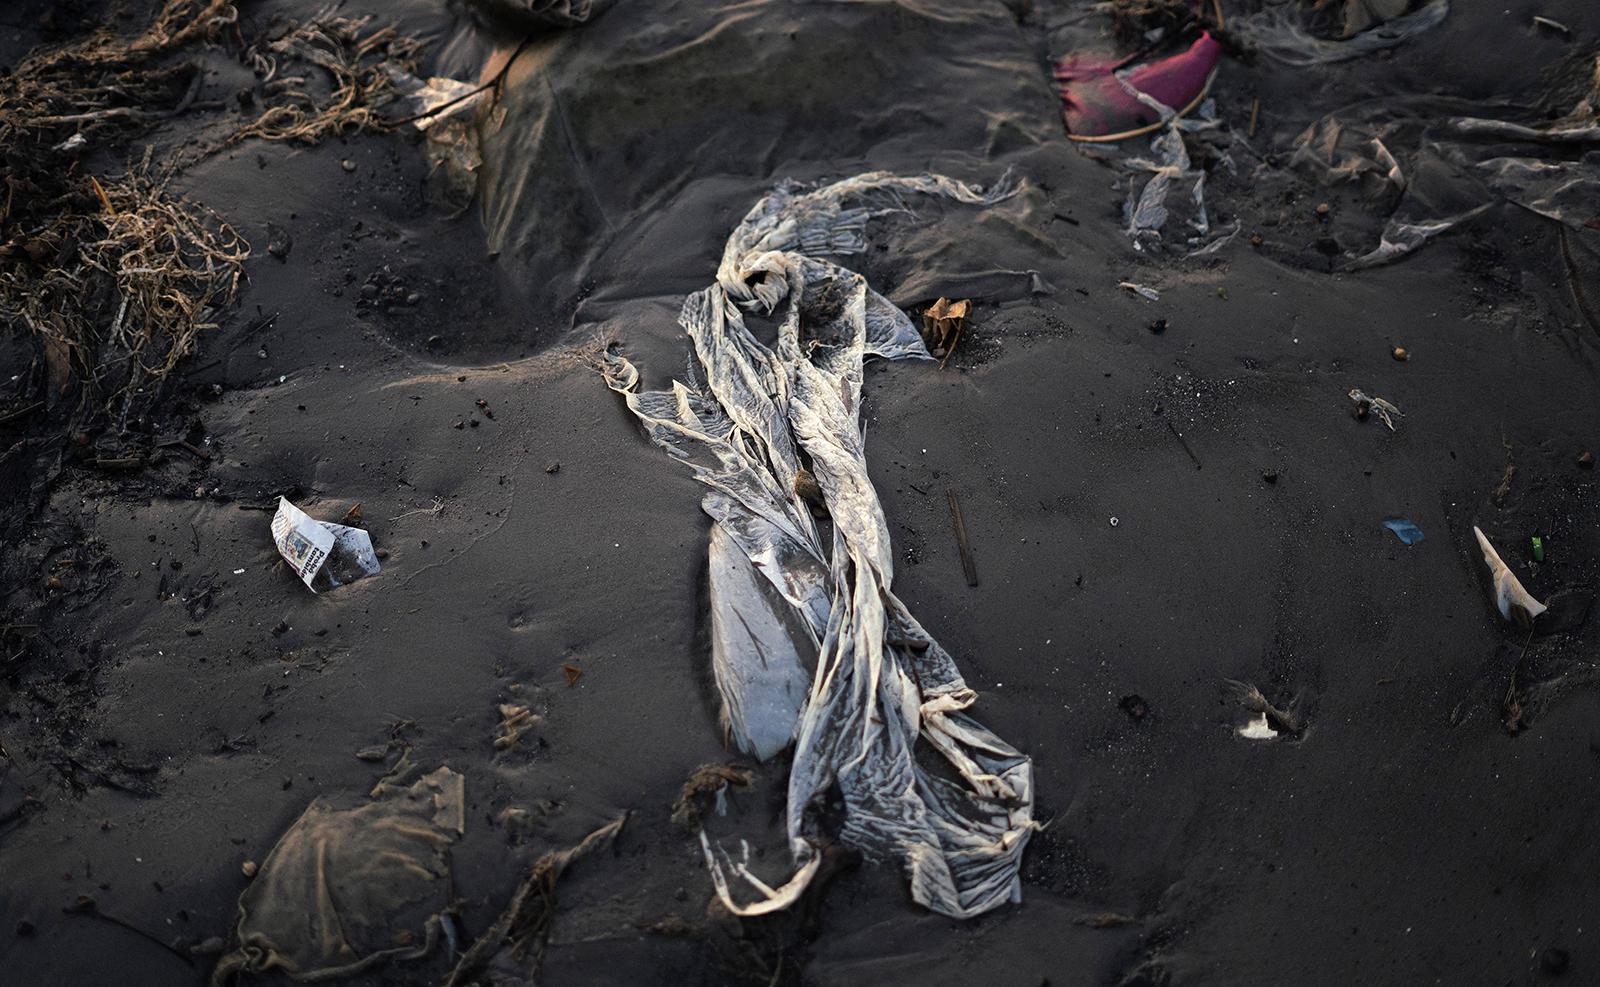 Plastic debris litters Capurro Beach in the bay of Montevideo, Uruguay, Monday, Dec. 2, 2019. AP